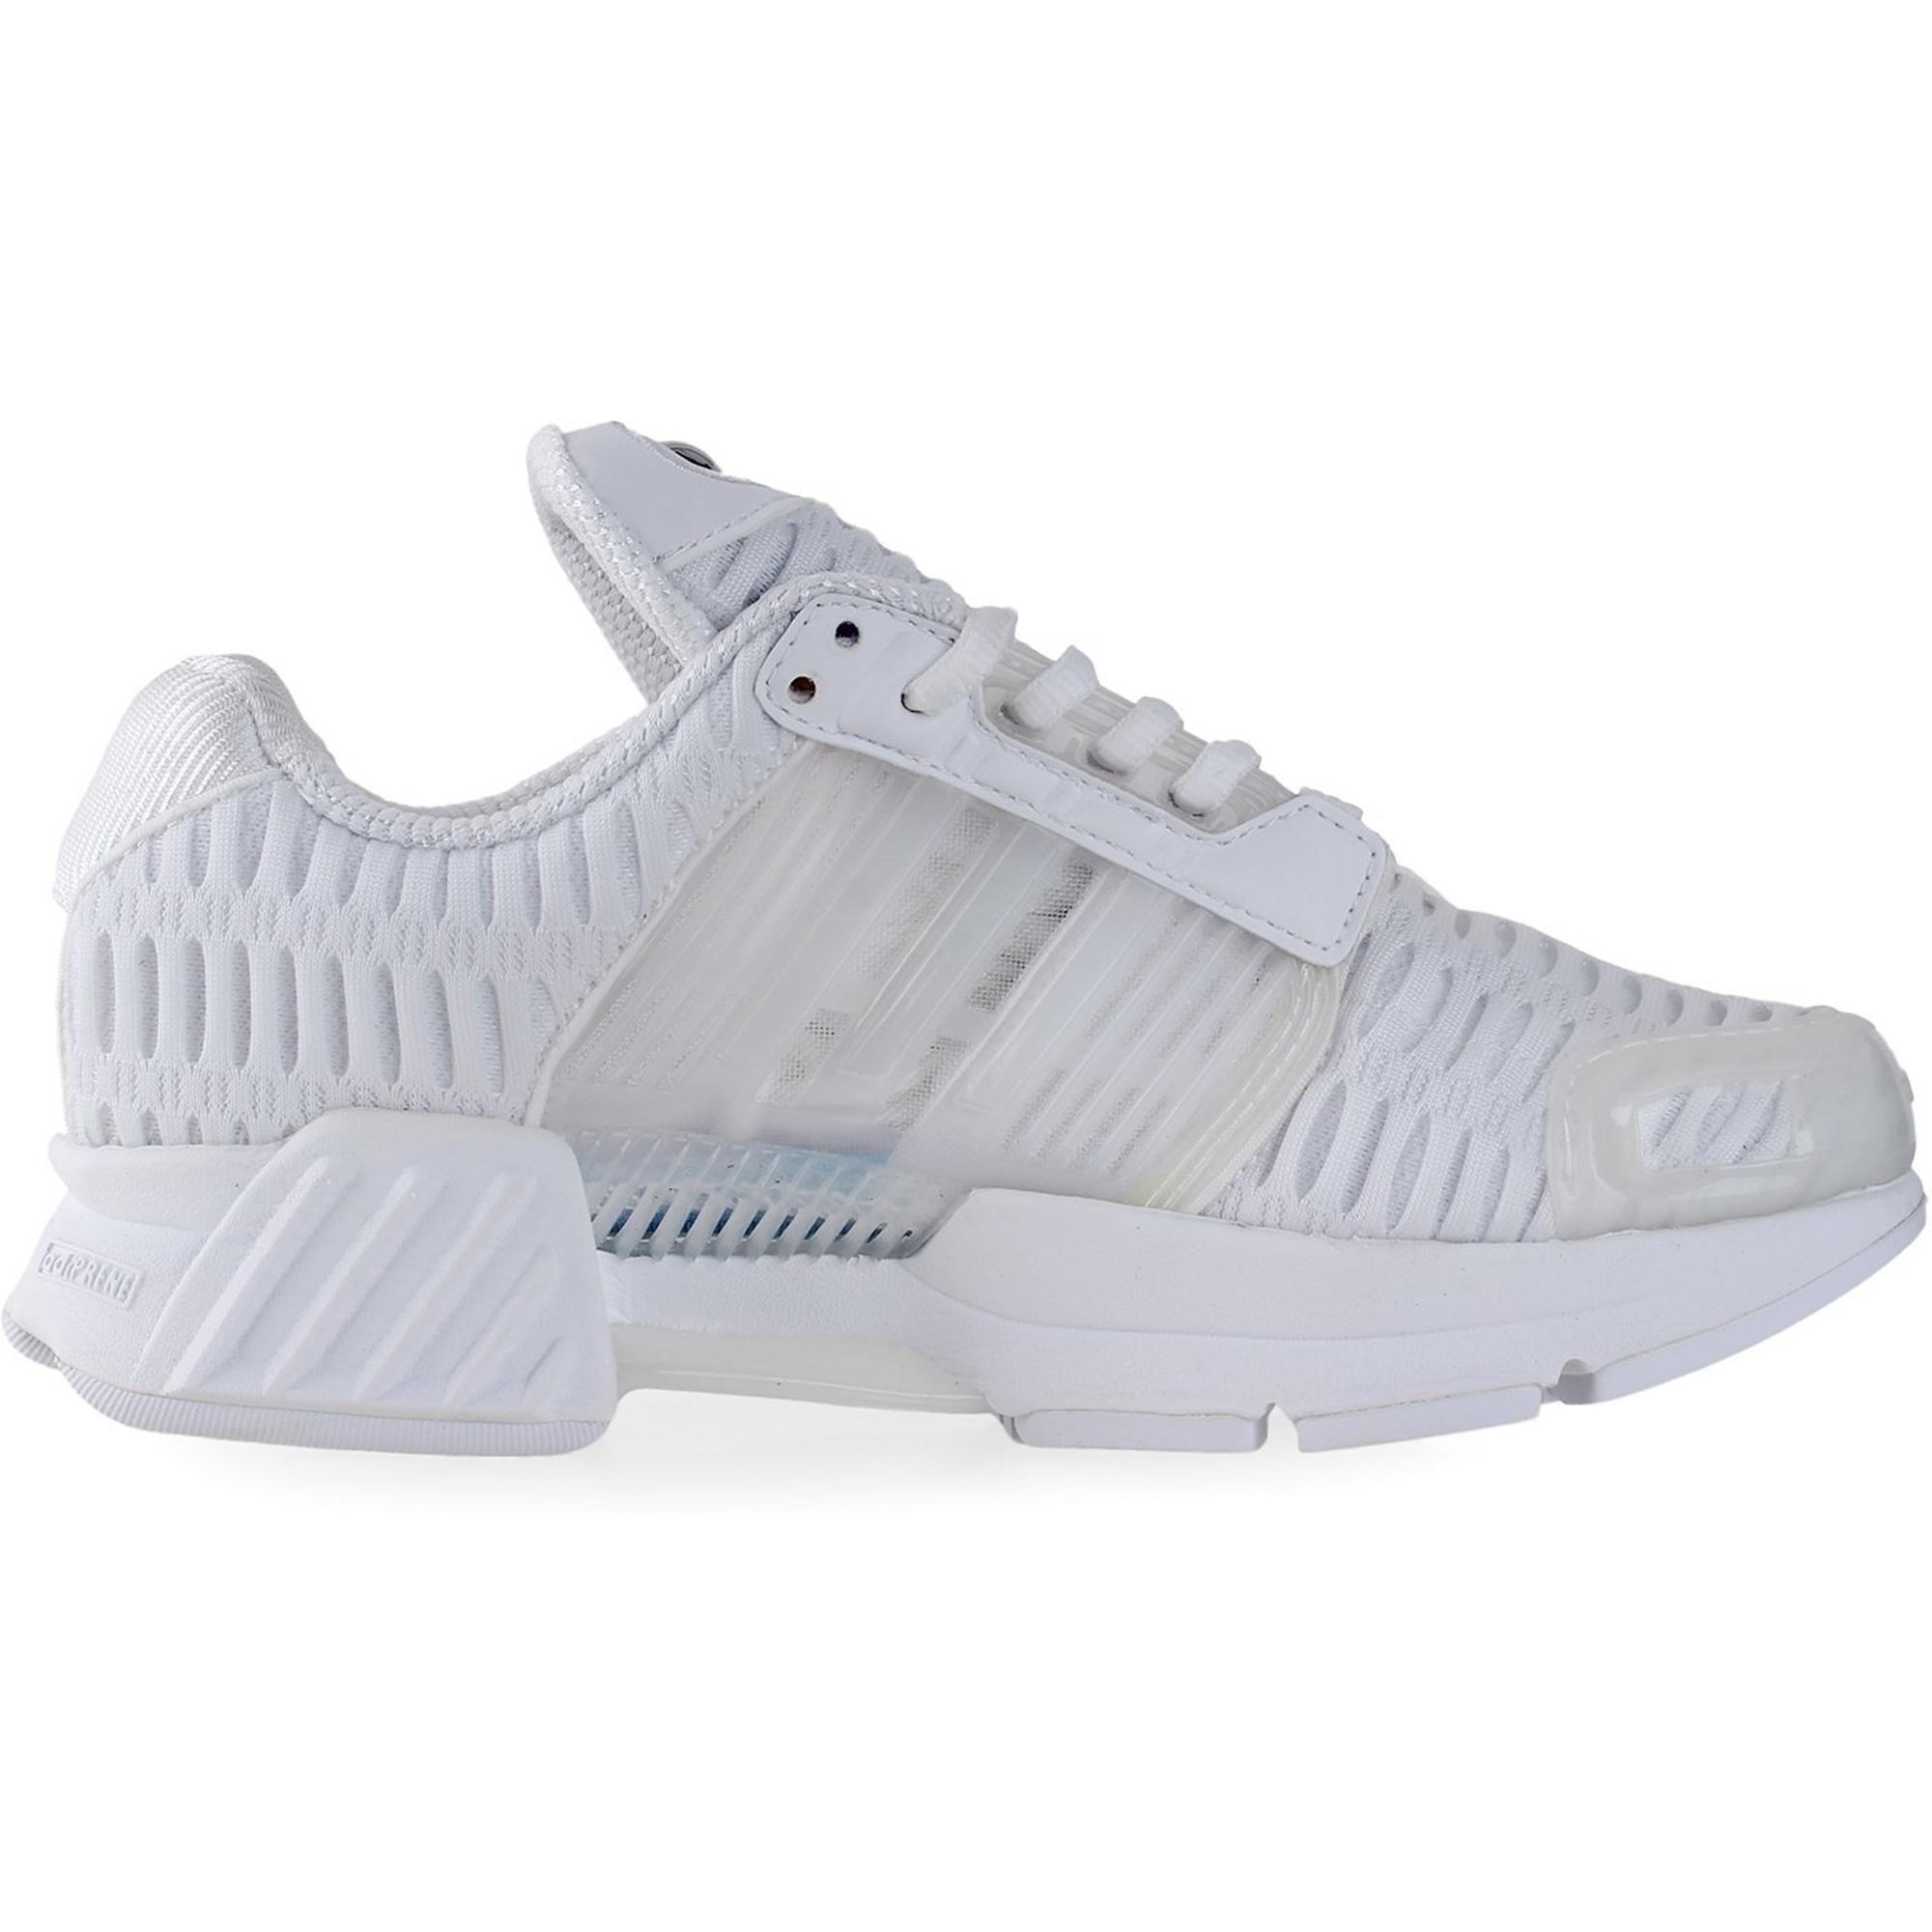 adidas climacool junior cheap online